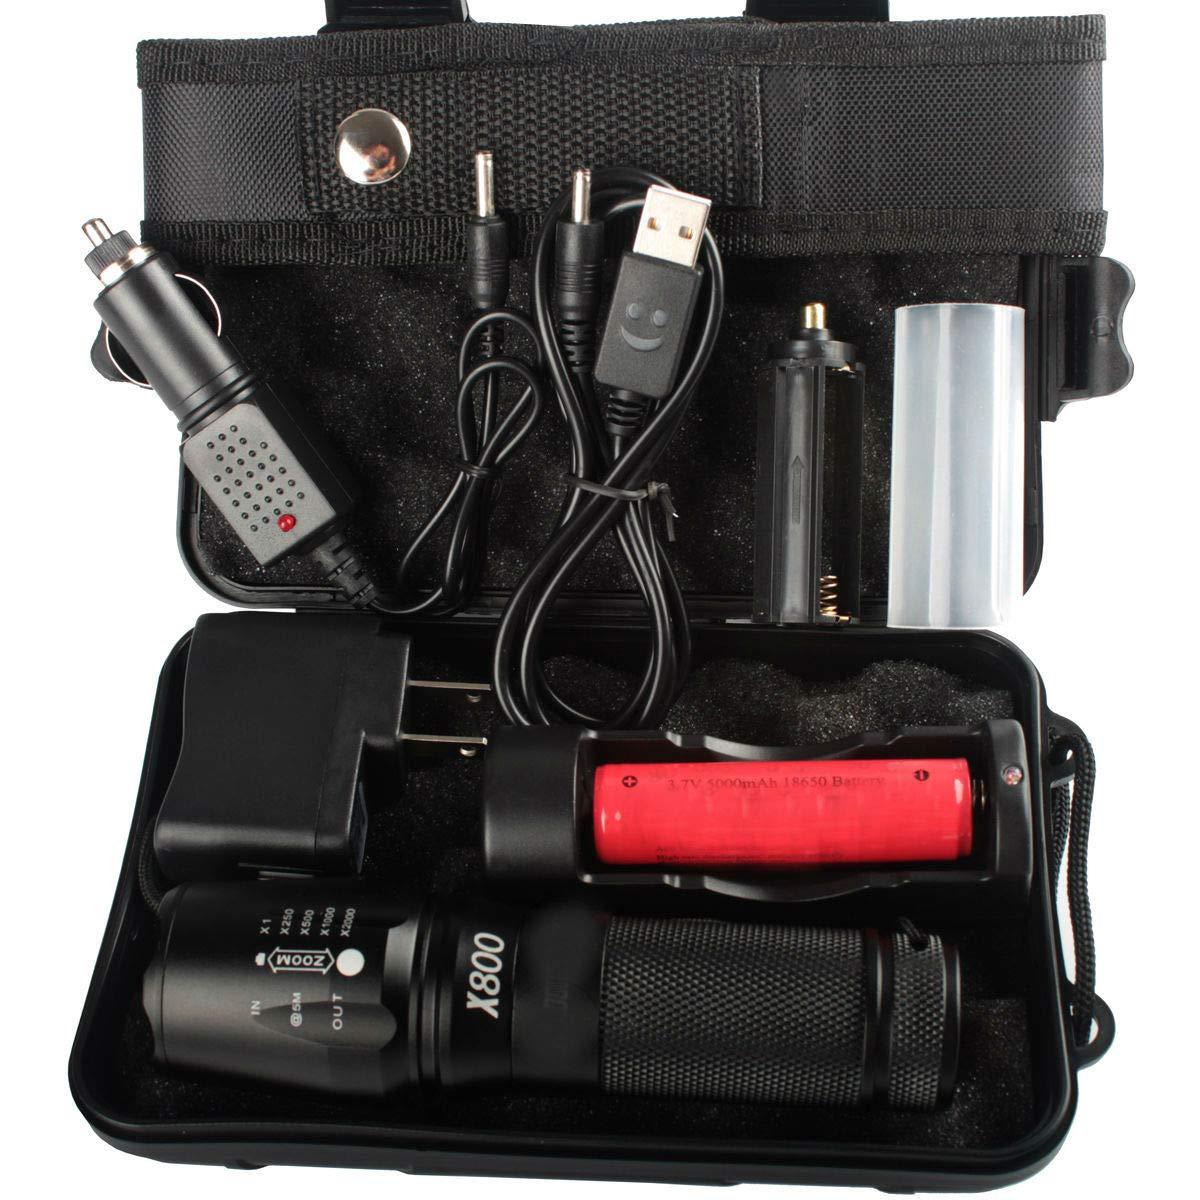 20000LM Genuine Shadowhawk X800 Flashlight XM-L L2 LED MilitaryTactical Torch